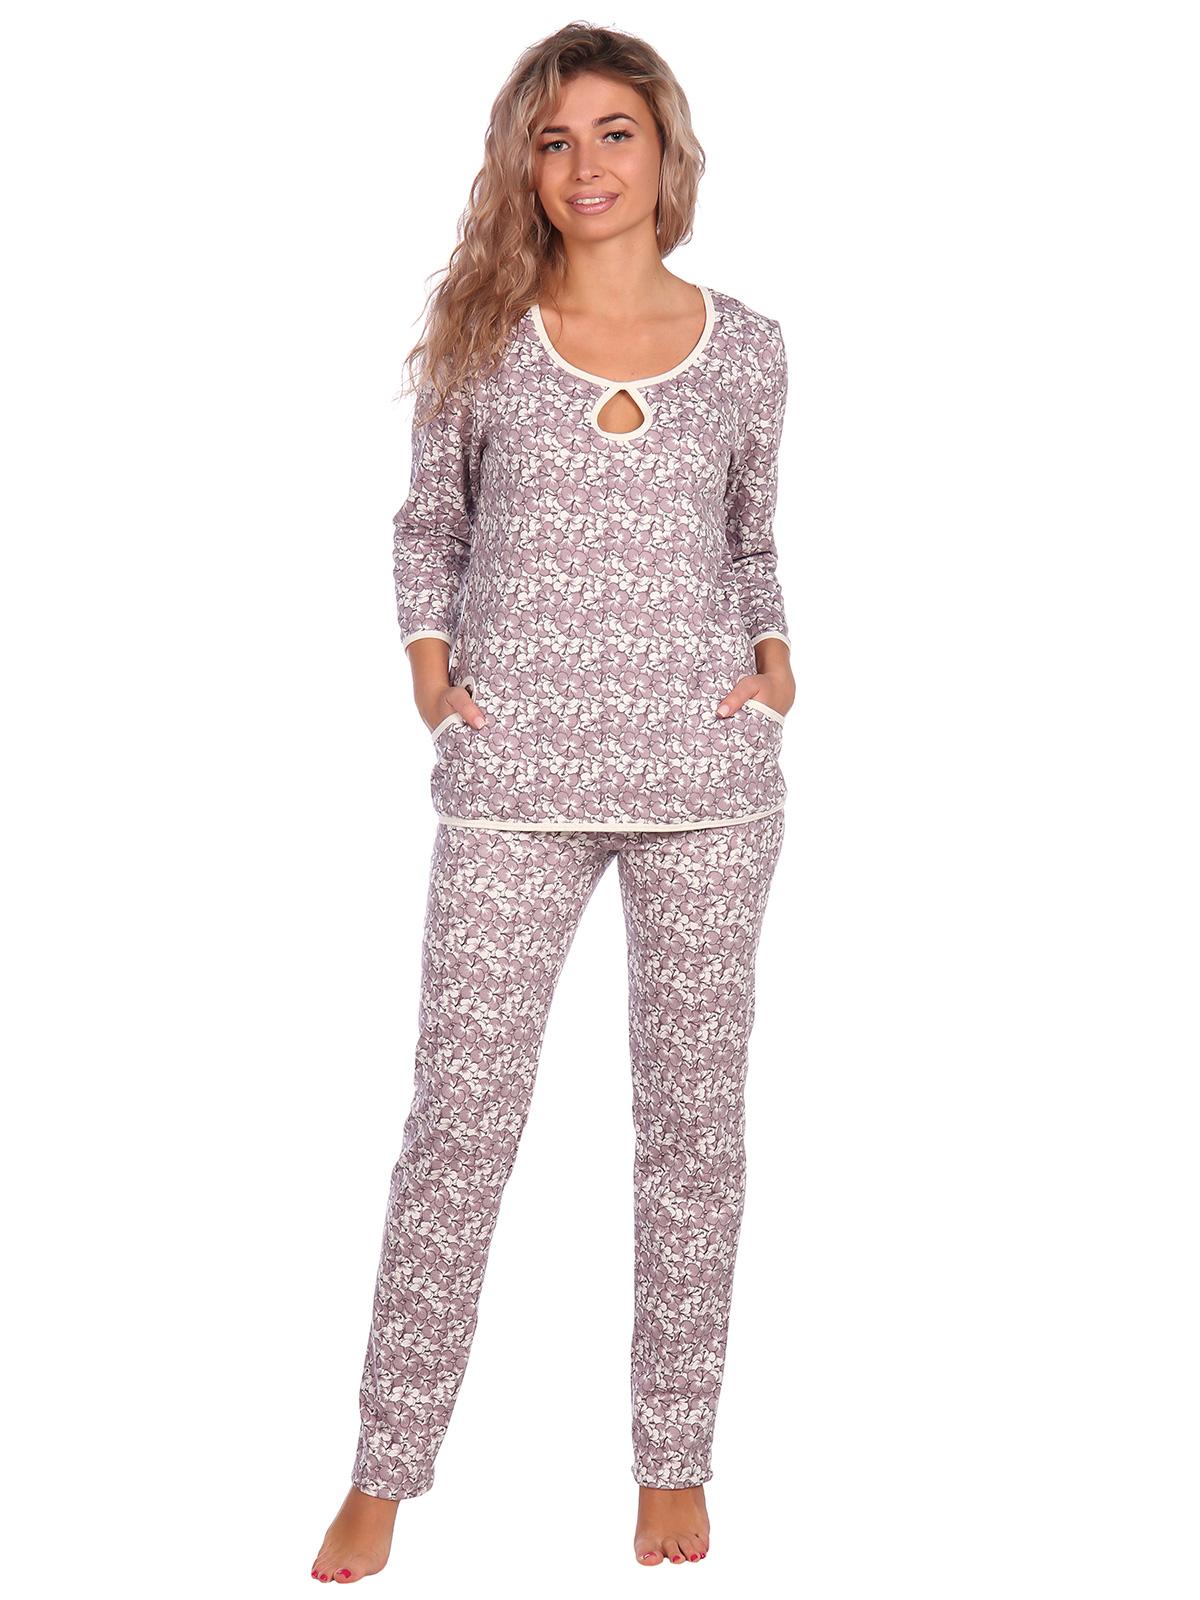 Жен. пижама арт. 16-0637 Кофейный р. 52 НСД Трикотаж